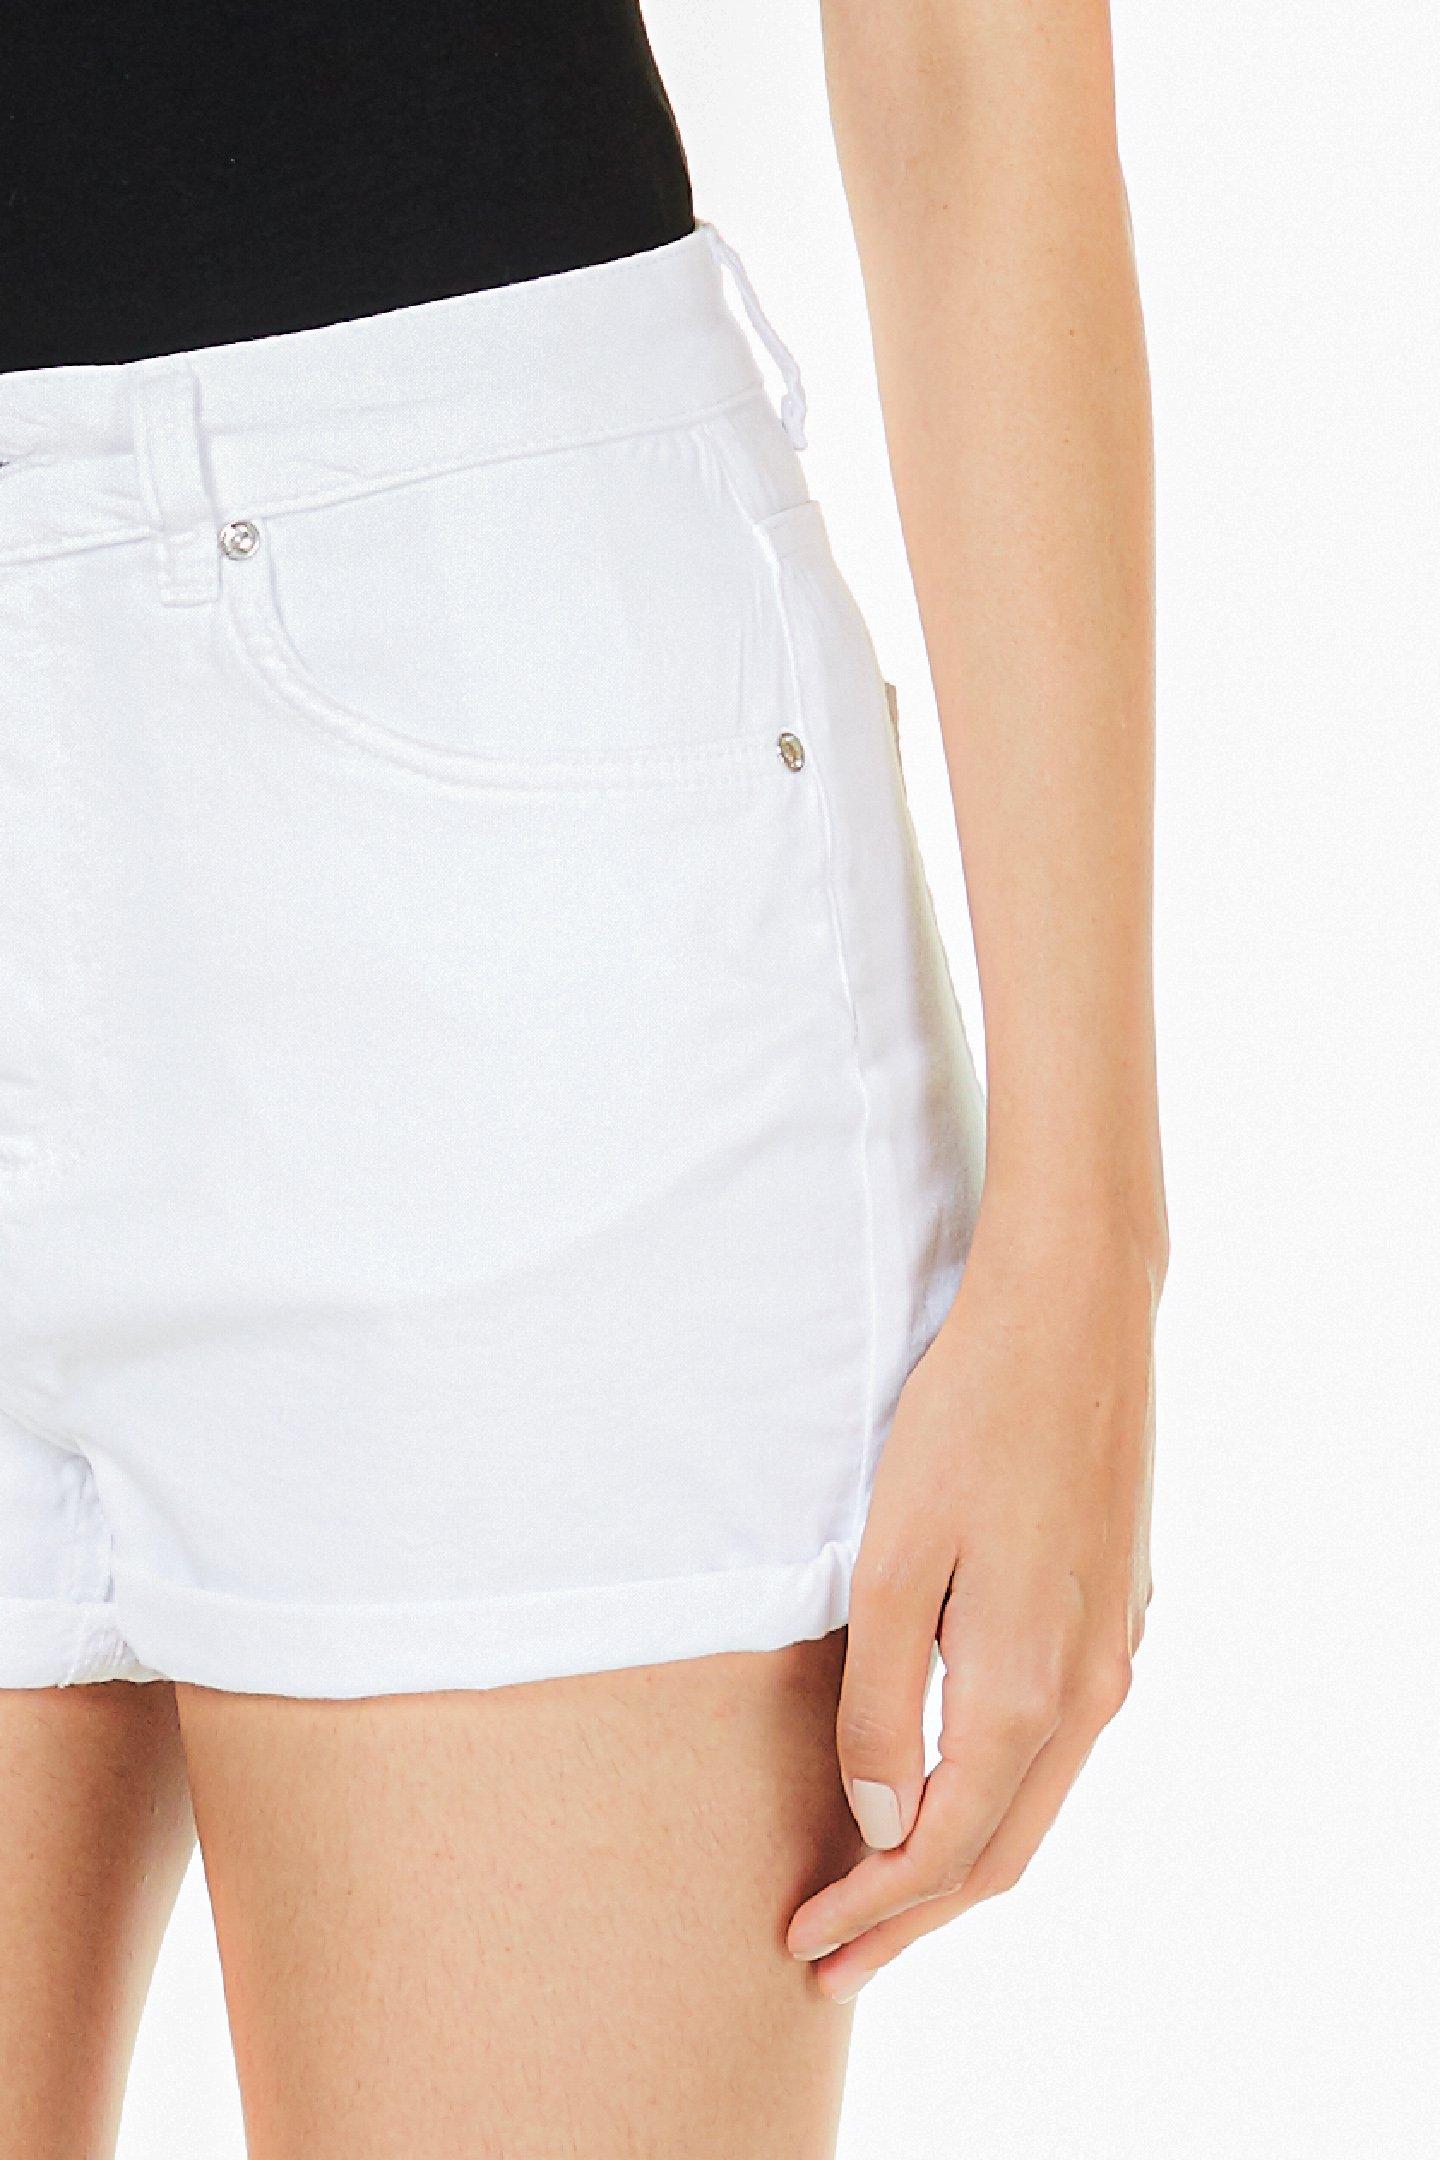 shorts milkshake liu jo LIU JO | Shorts | WA1253T403311111